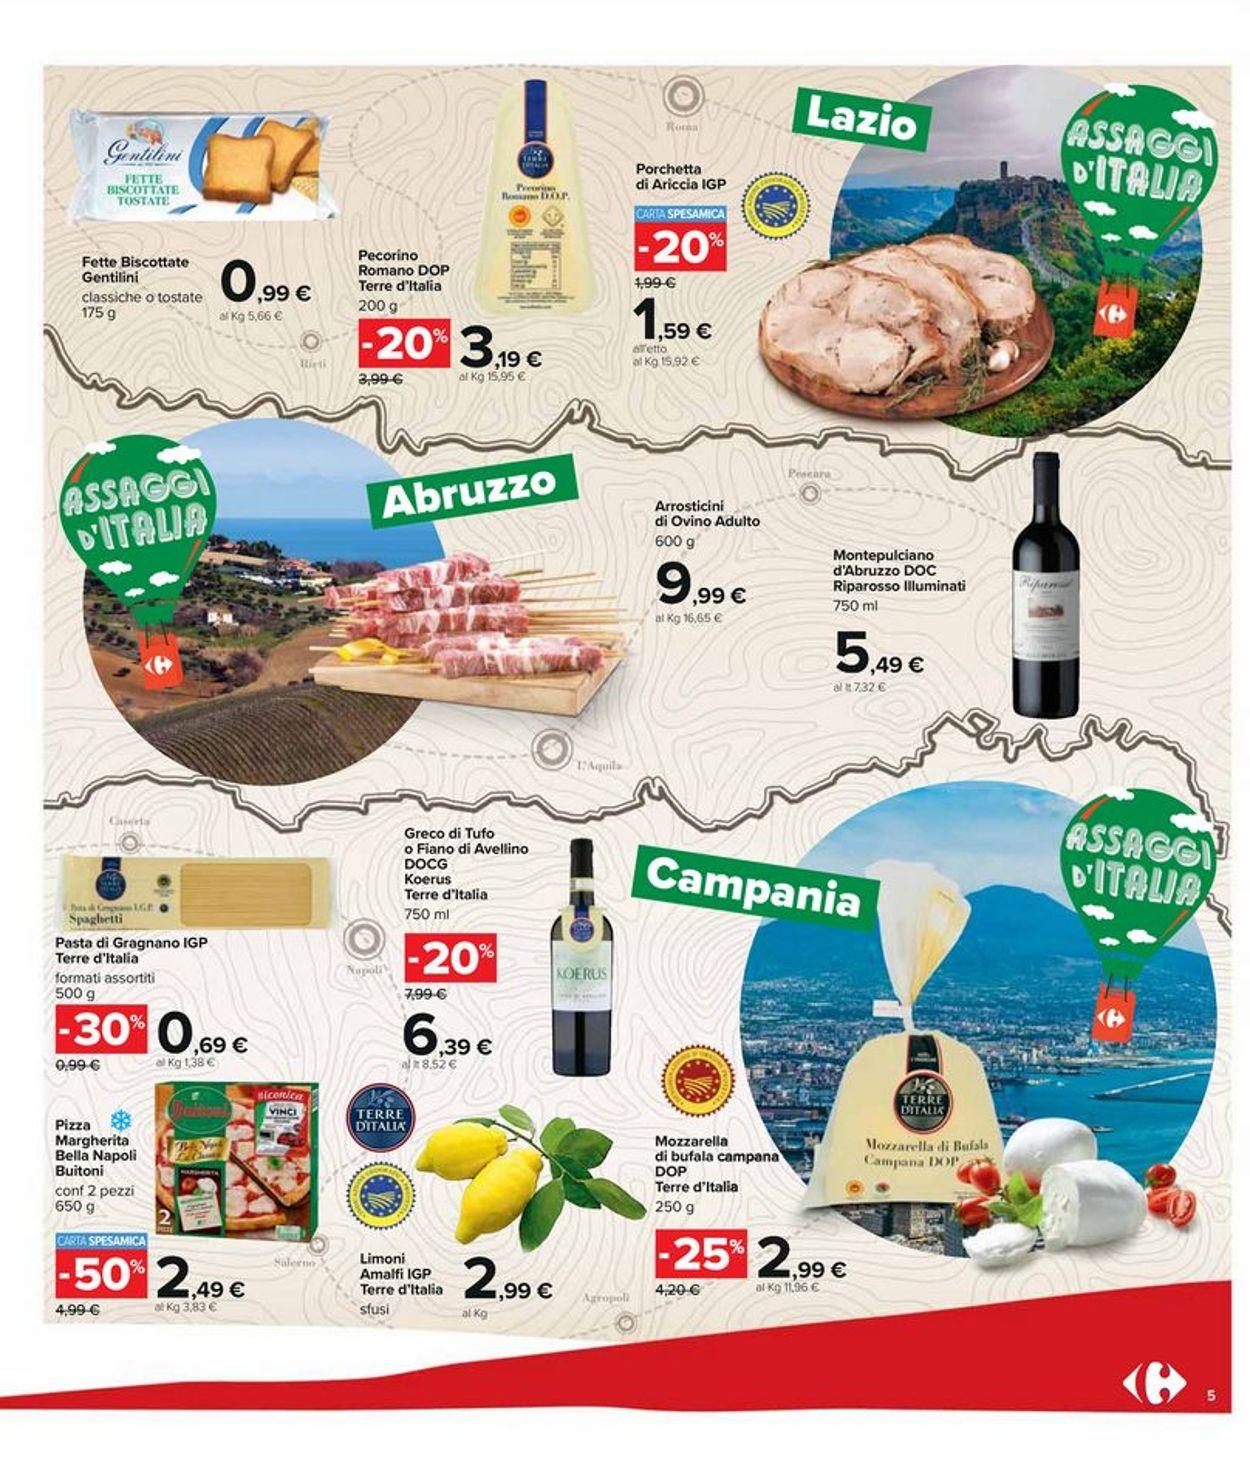 Volantino Carrefour - Offerte 17/06-30/06/2021 (Pagina 5)